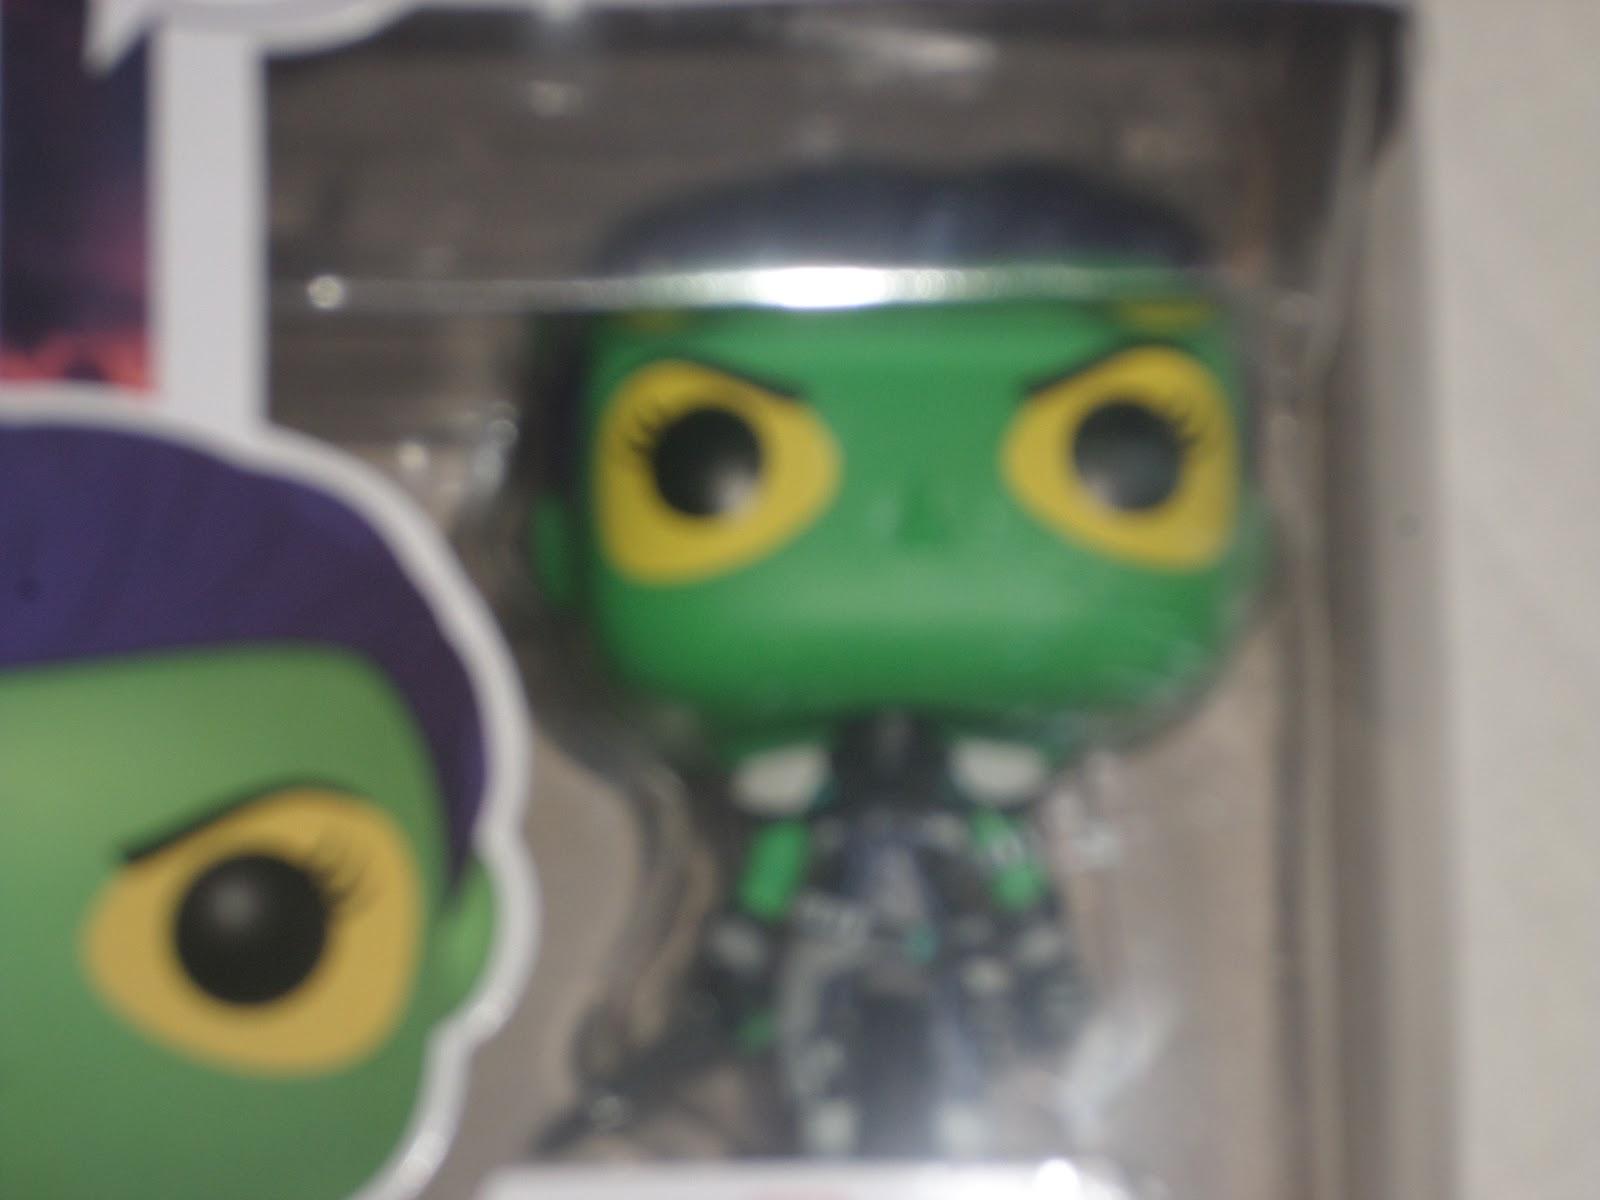 Funko Pop #277 Guardians of the Galaxy Gamora Marvel Gamerverse New in Box